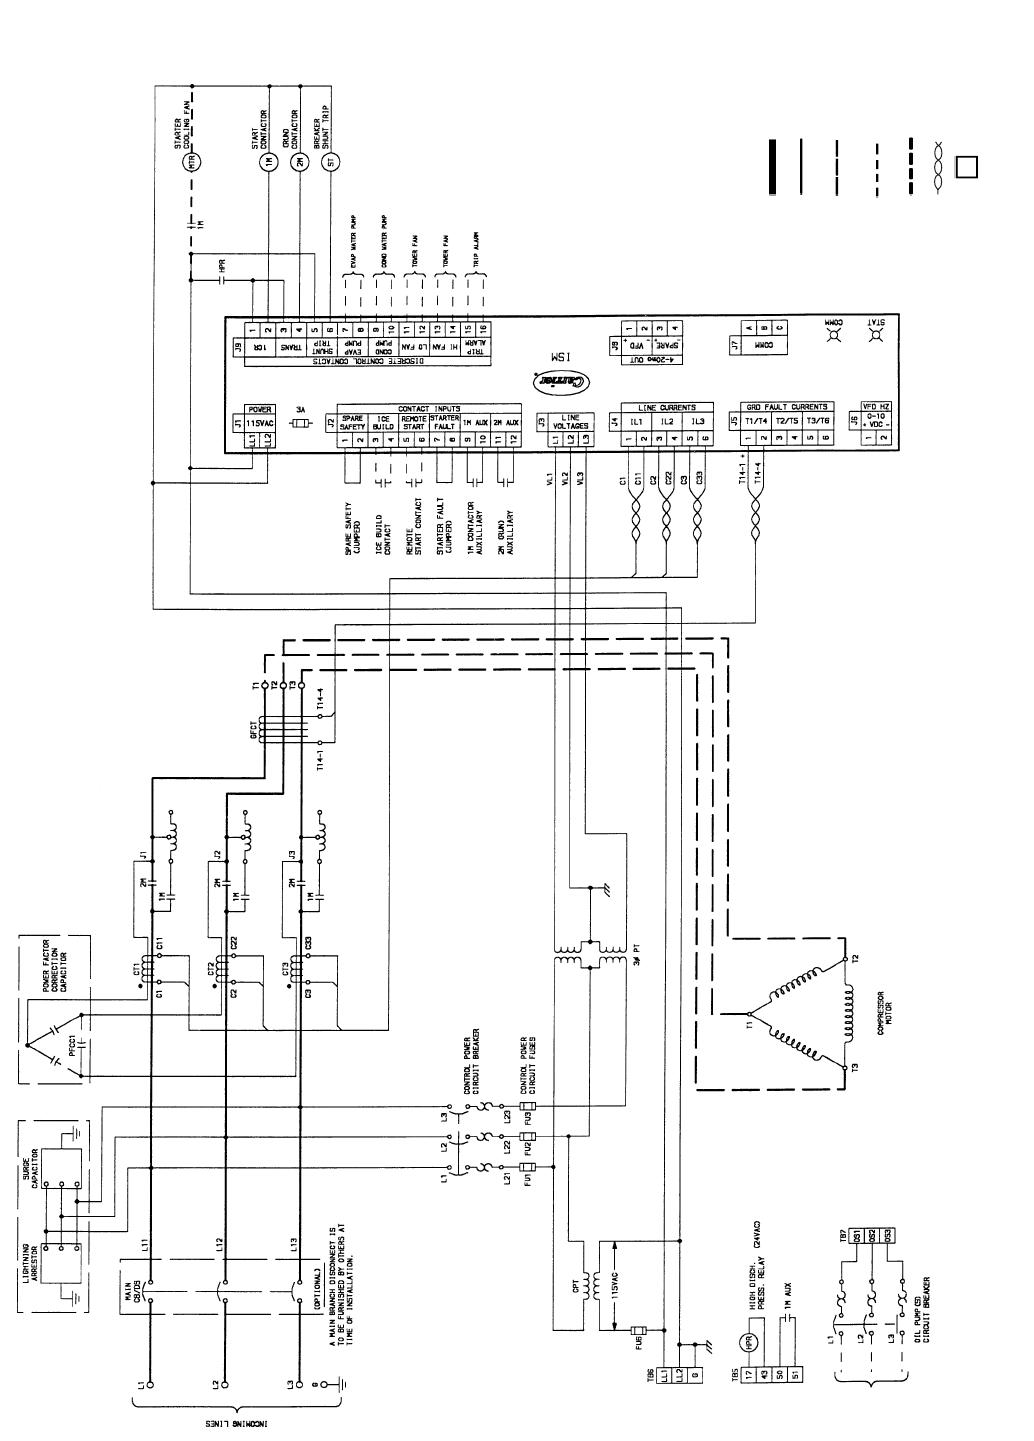 terminal block field wiring